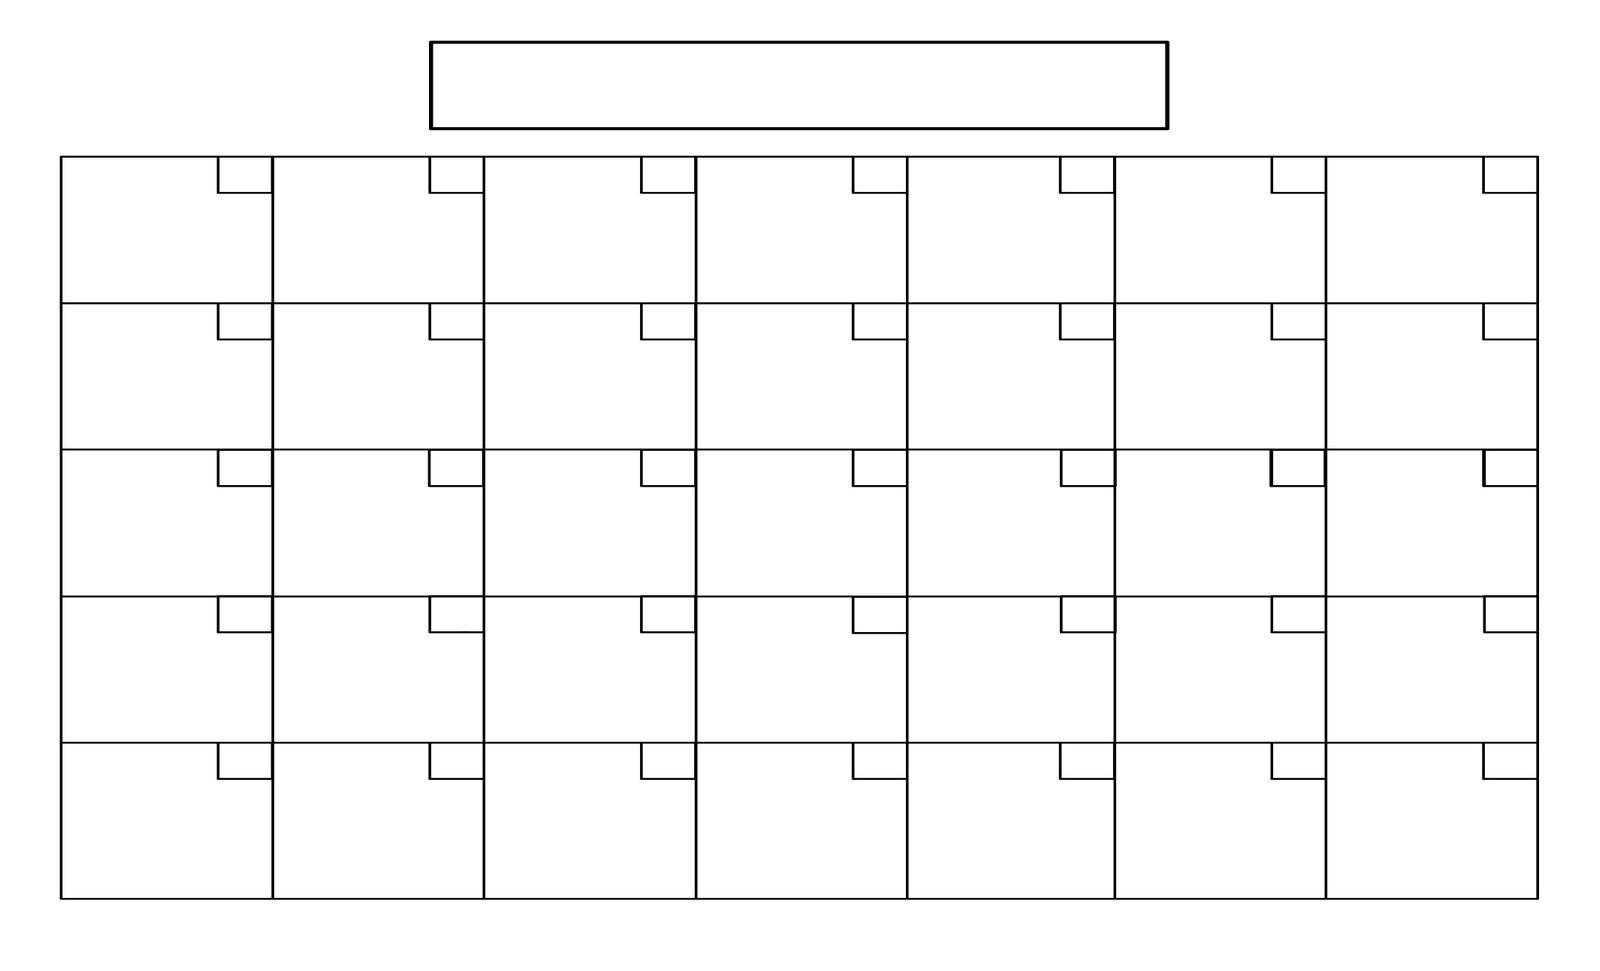 Printable+Full+Page+Blank+Calendar+Template | Blank Calendar for Free Fill In Printable Calendars